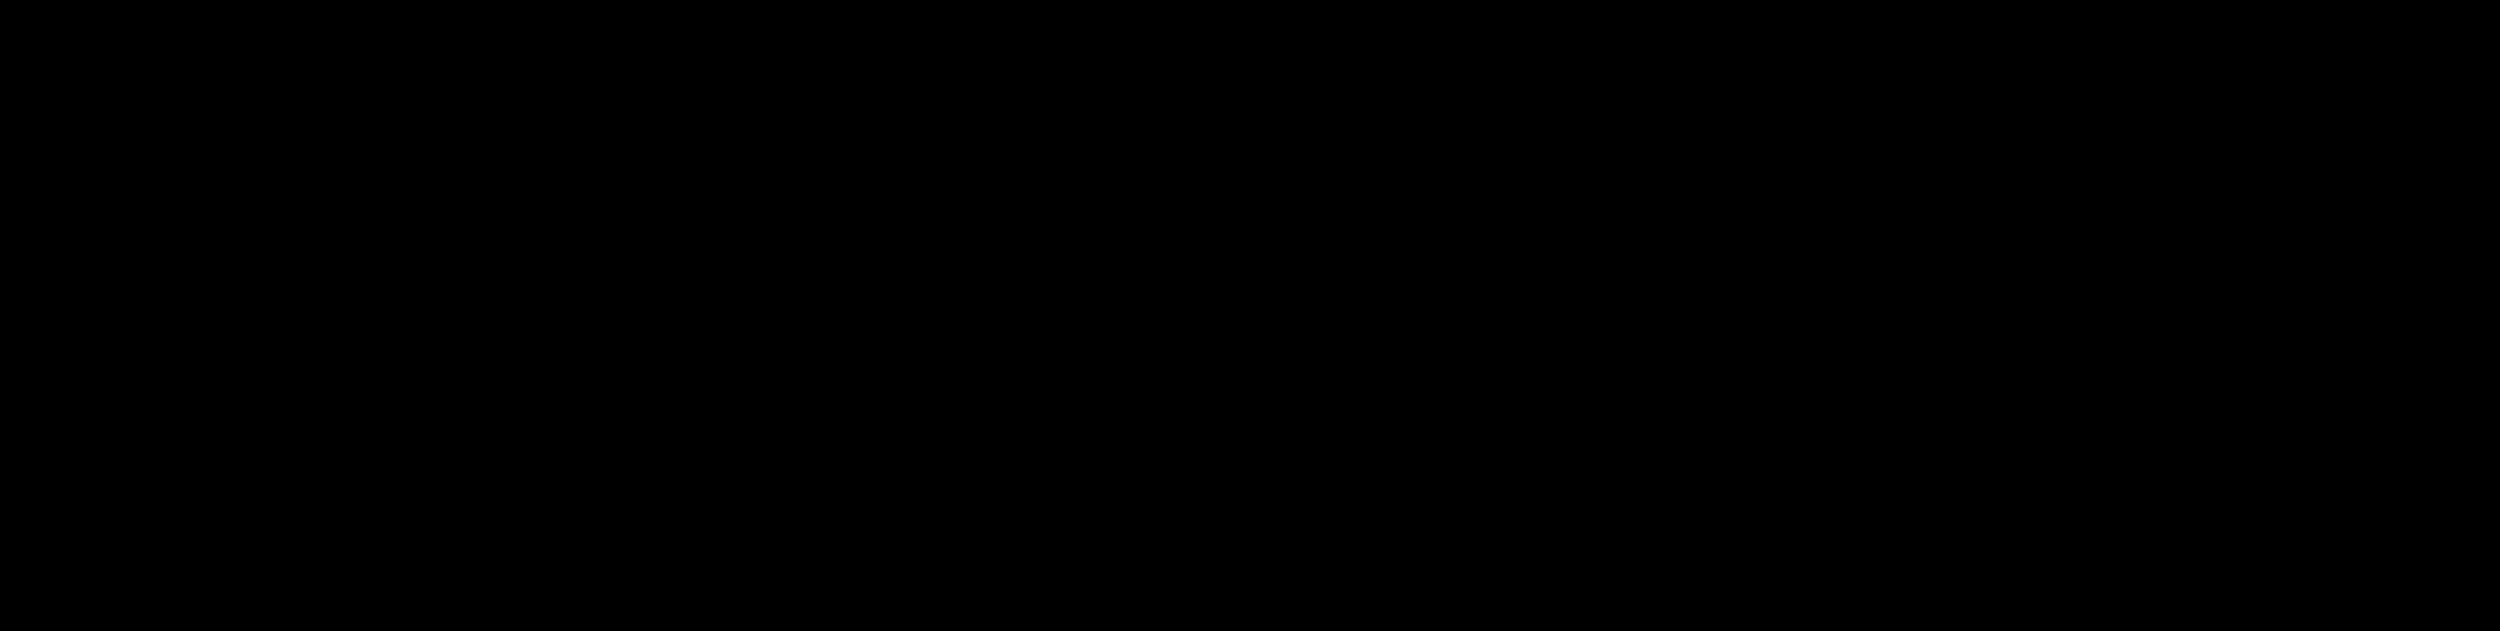 Master light years logo.png